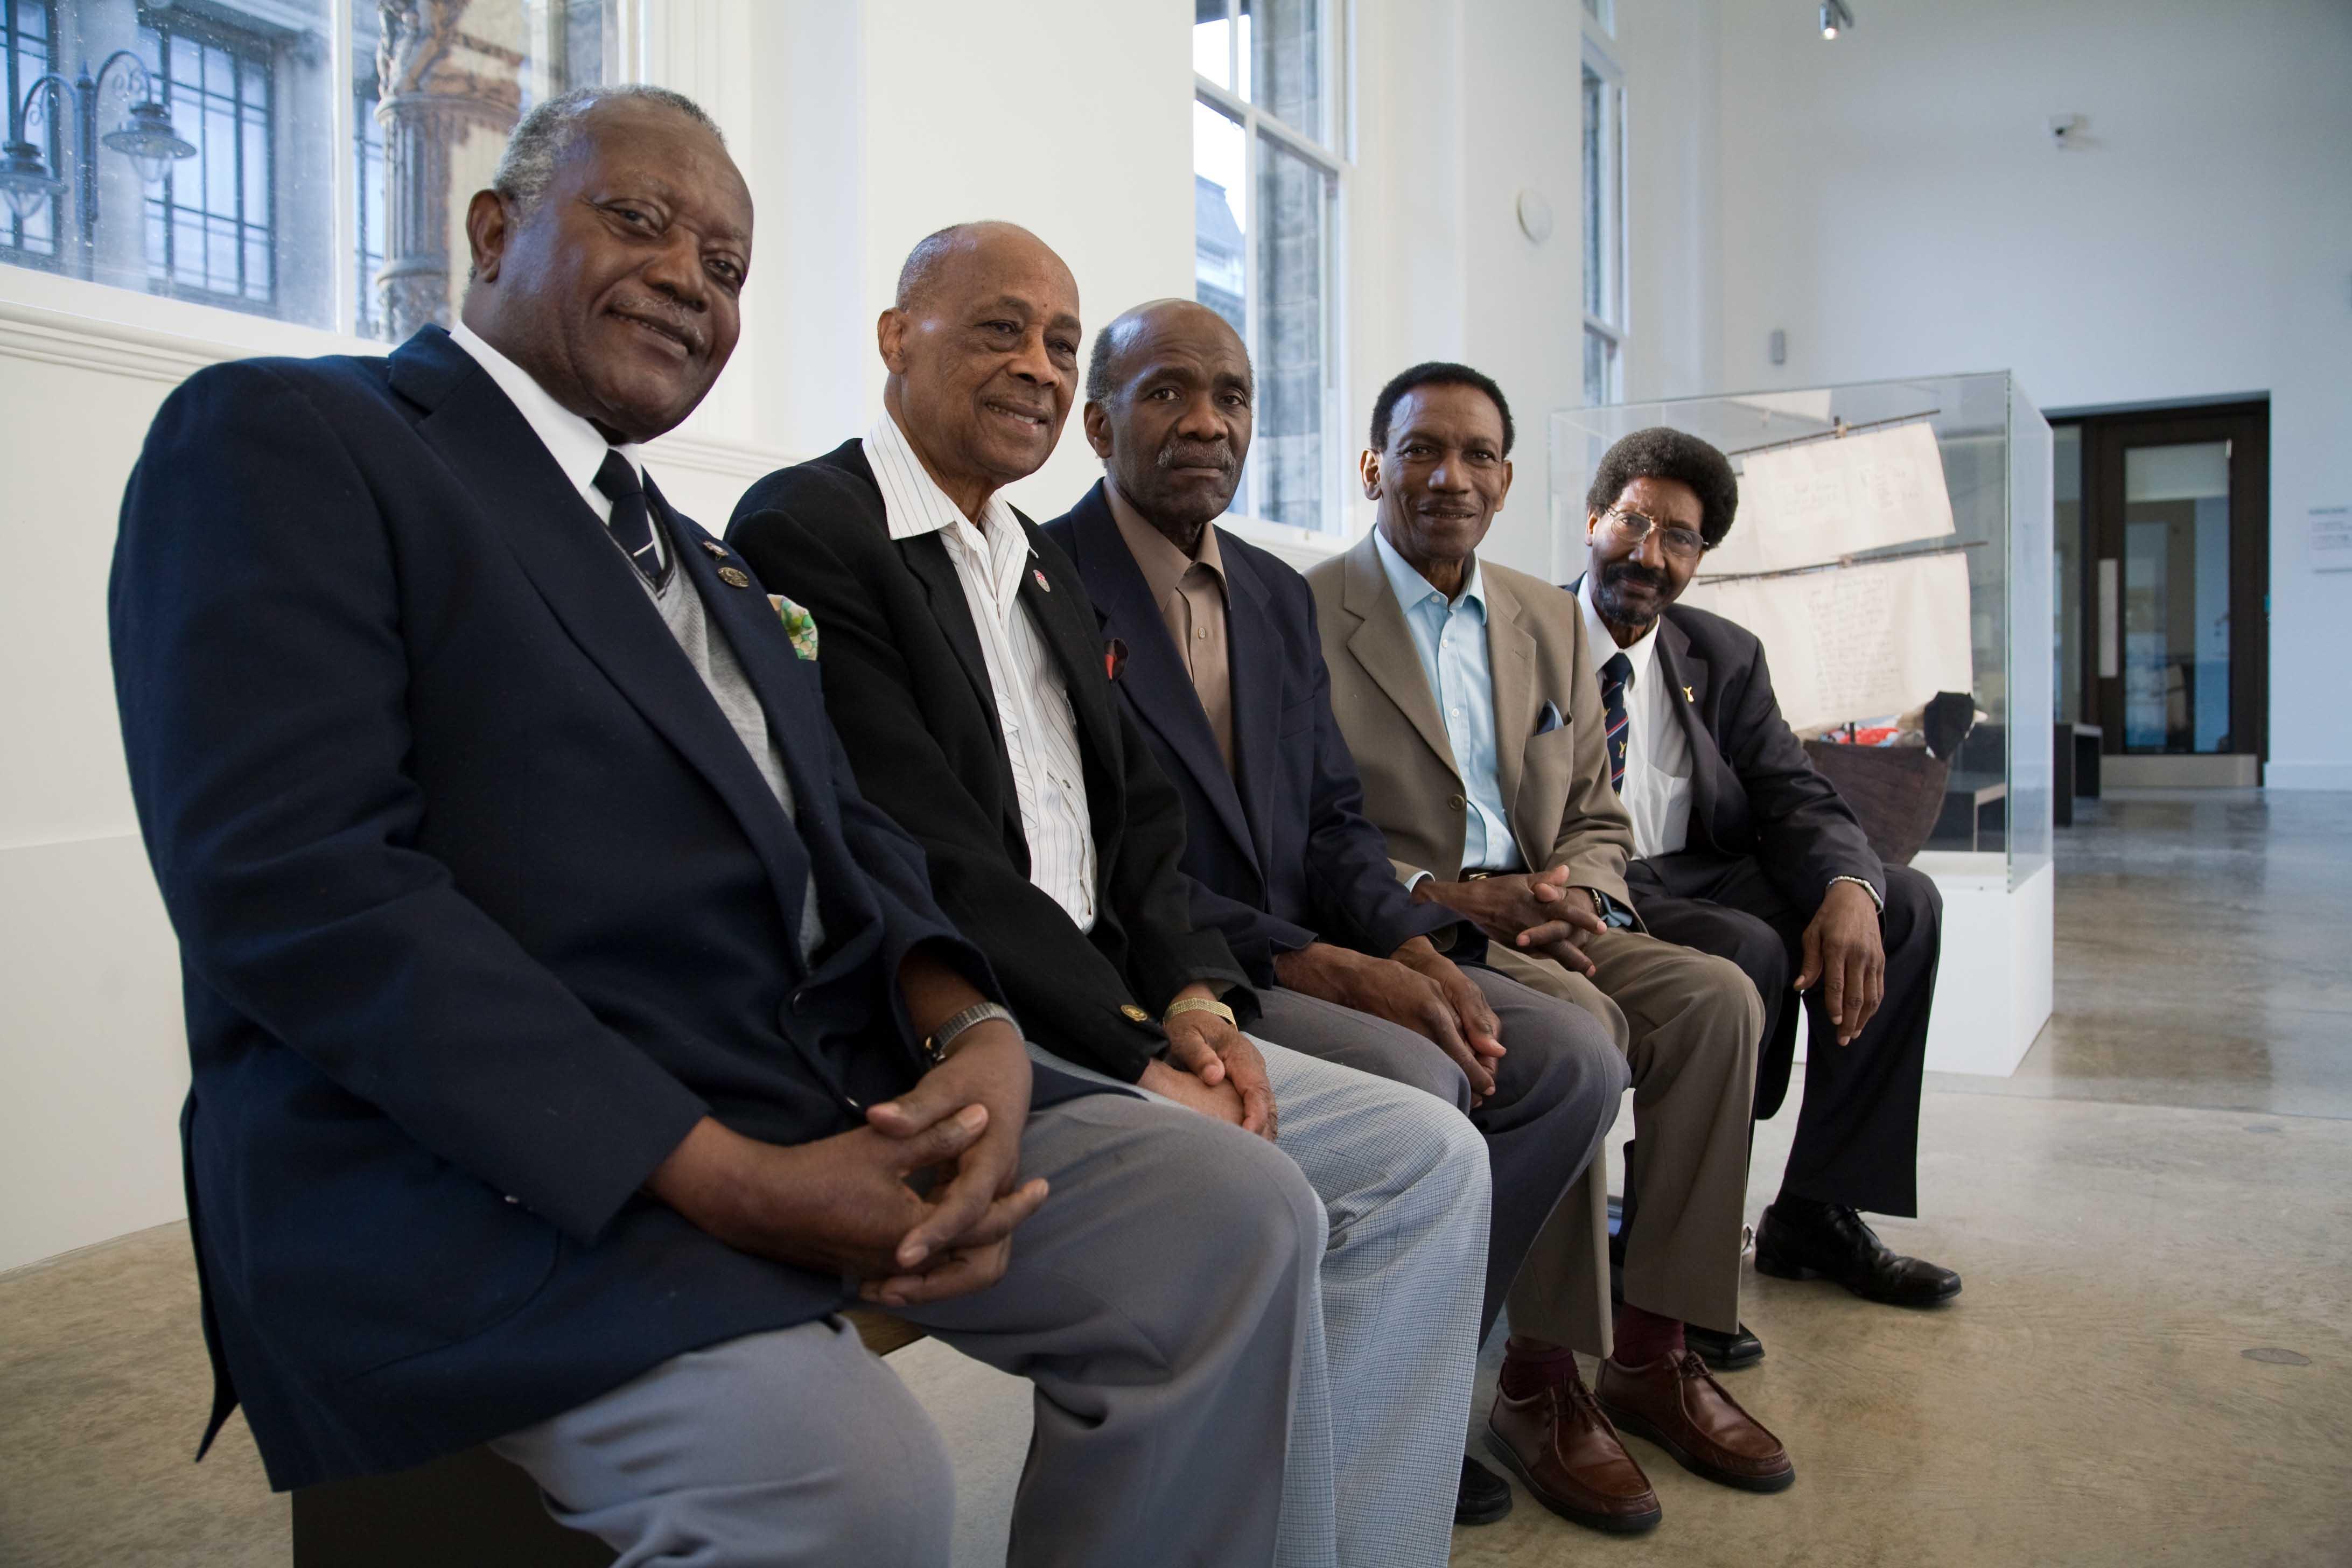 War Veterans from the West Indian Ex Service Association.  Image credit: Elston Ruddock